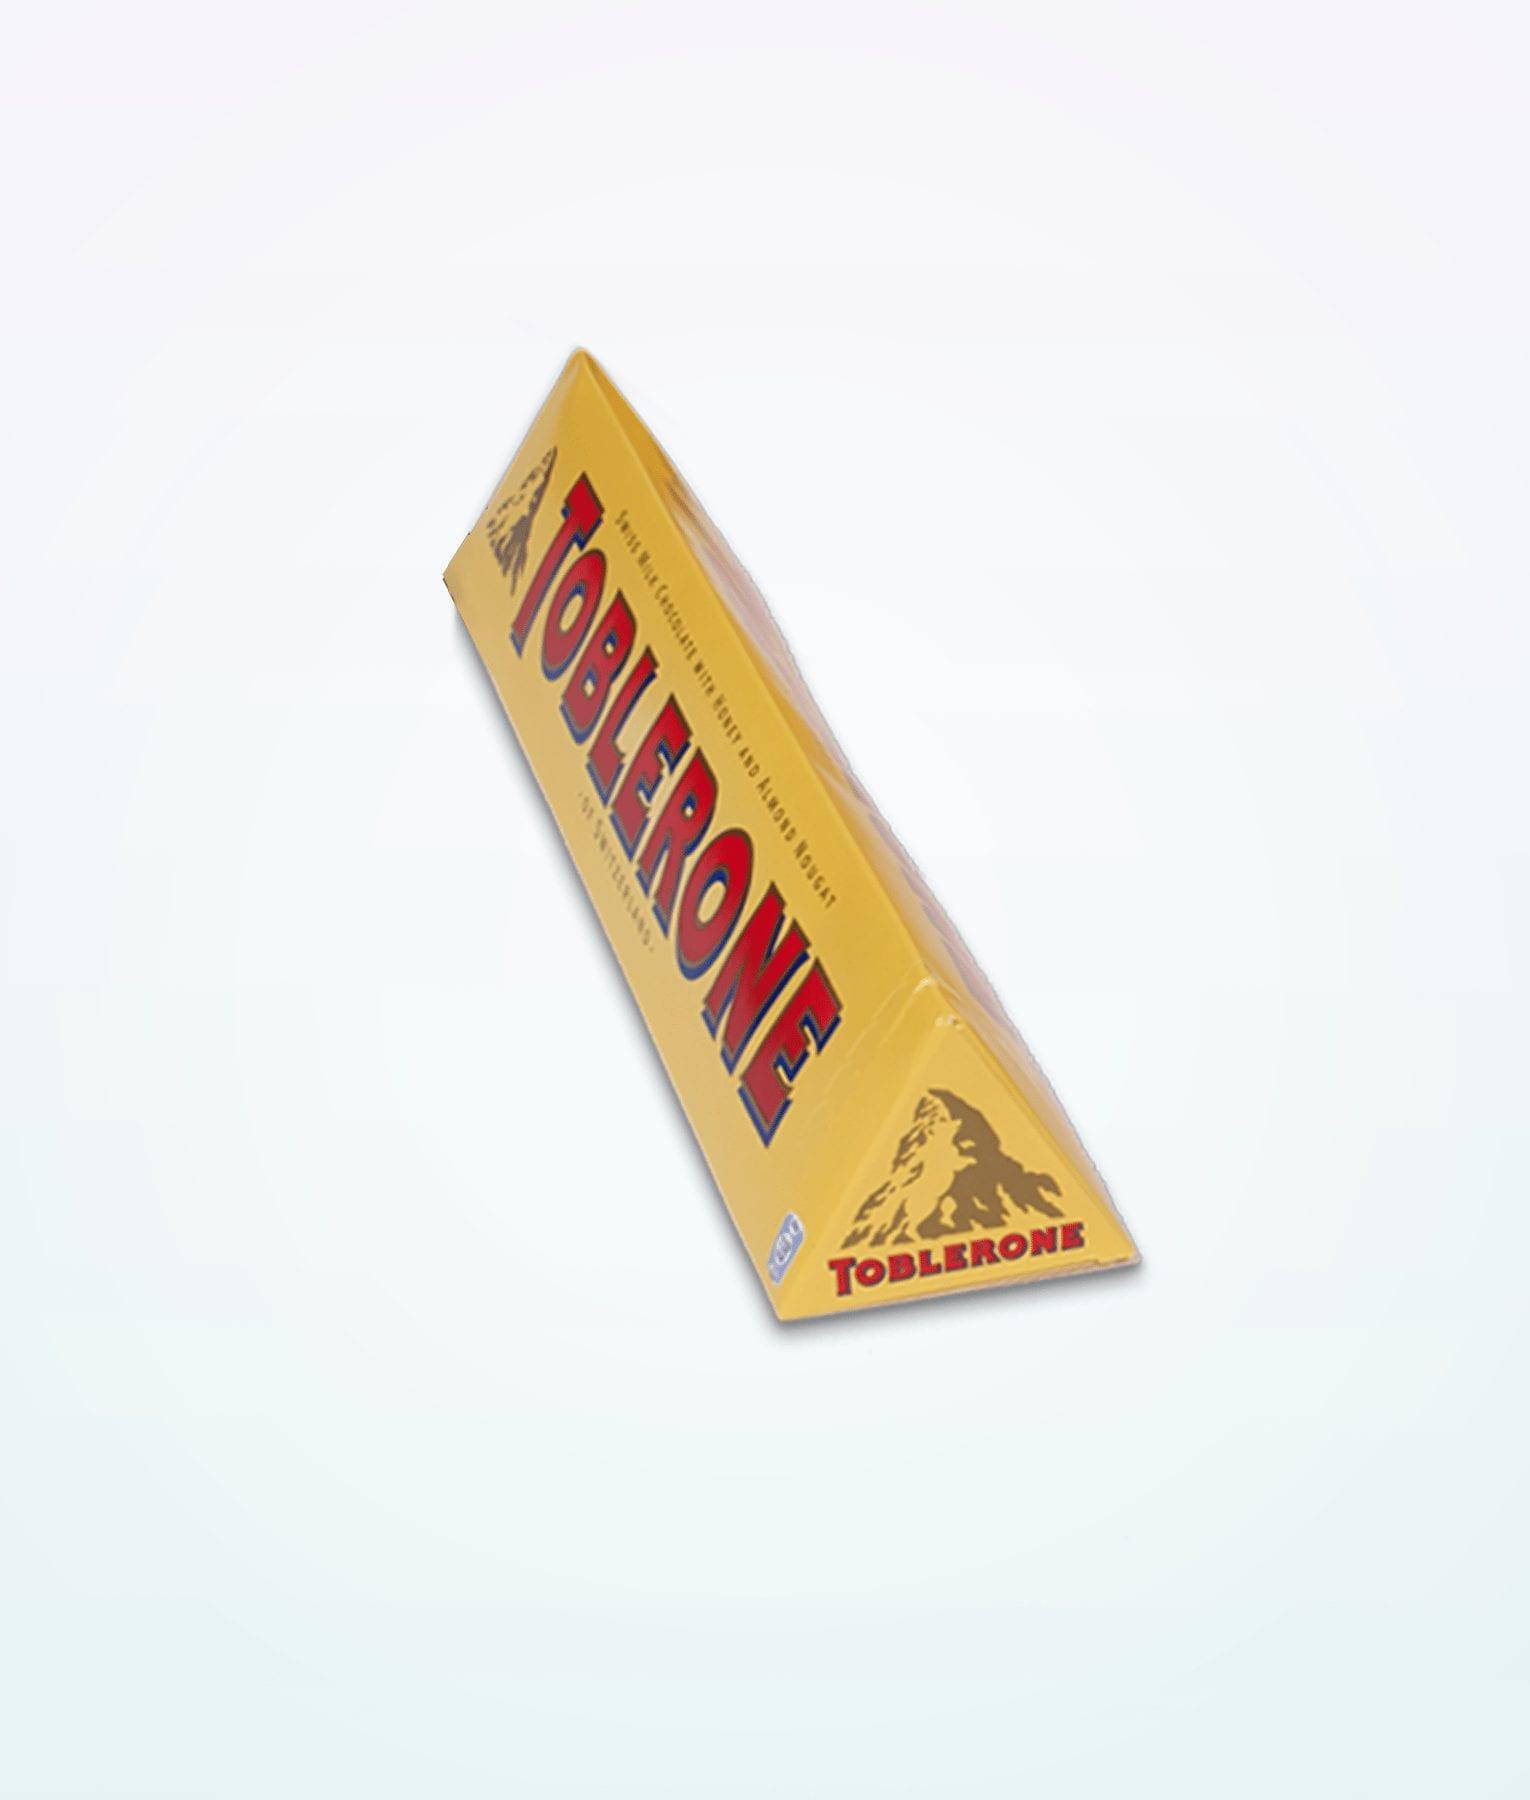 toblerone-jumbo